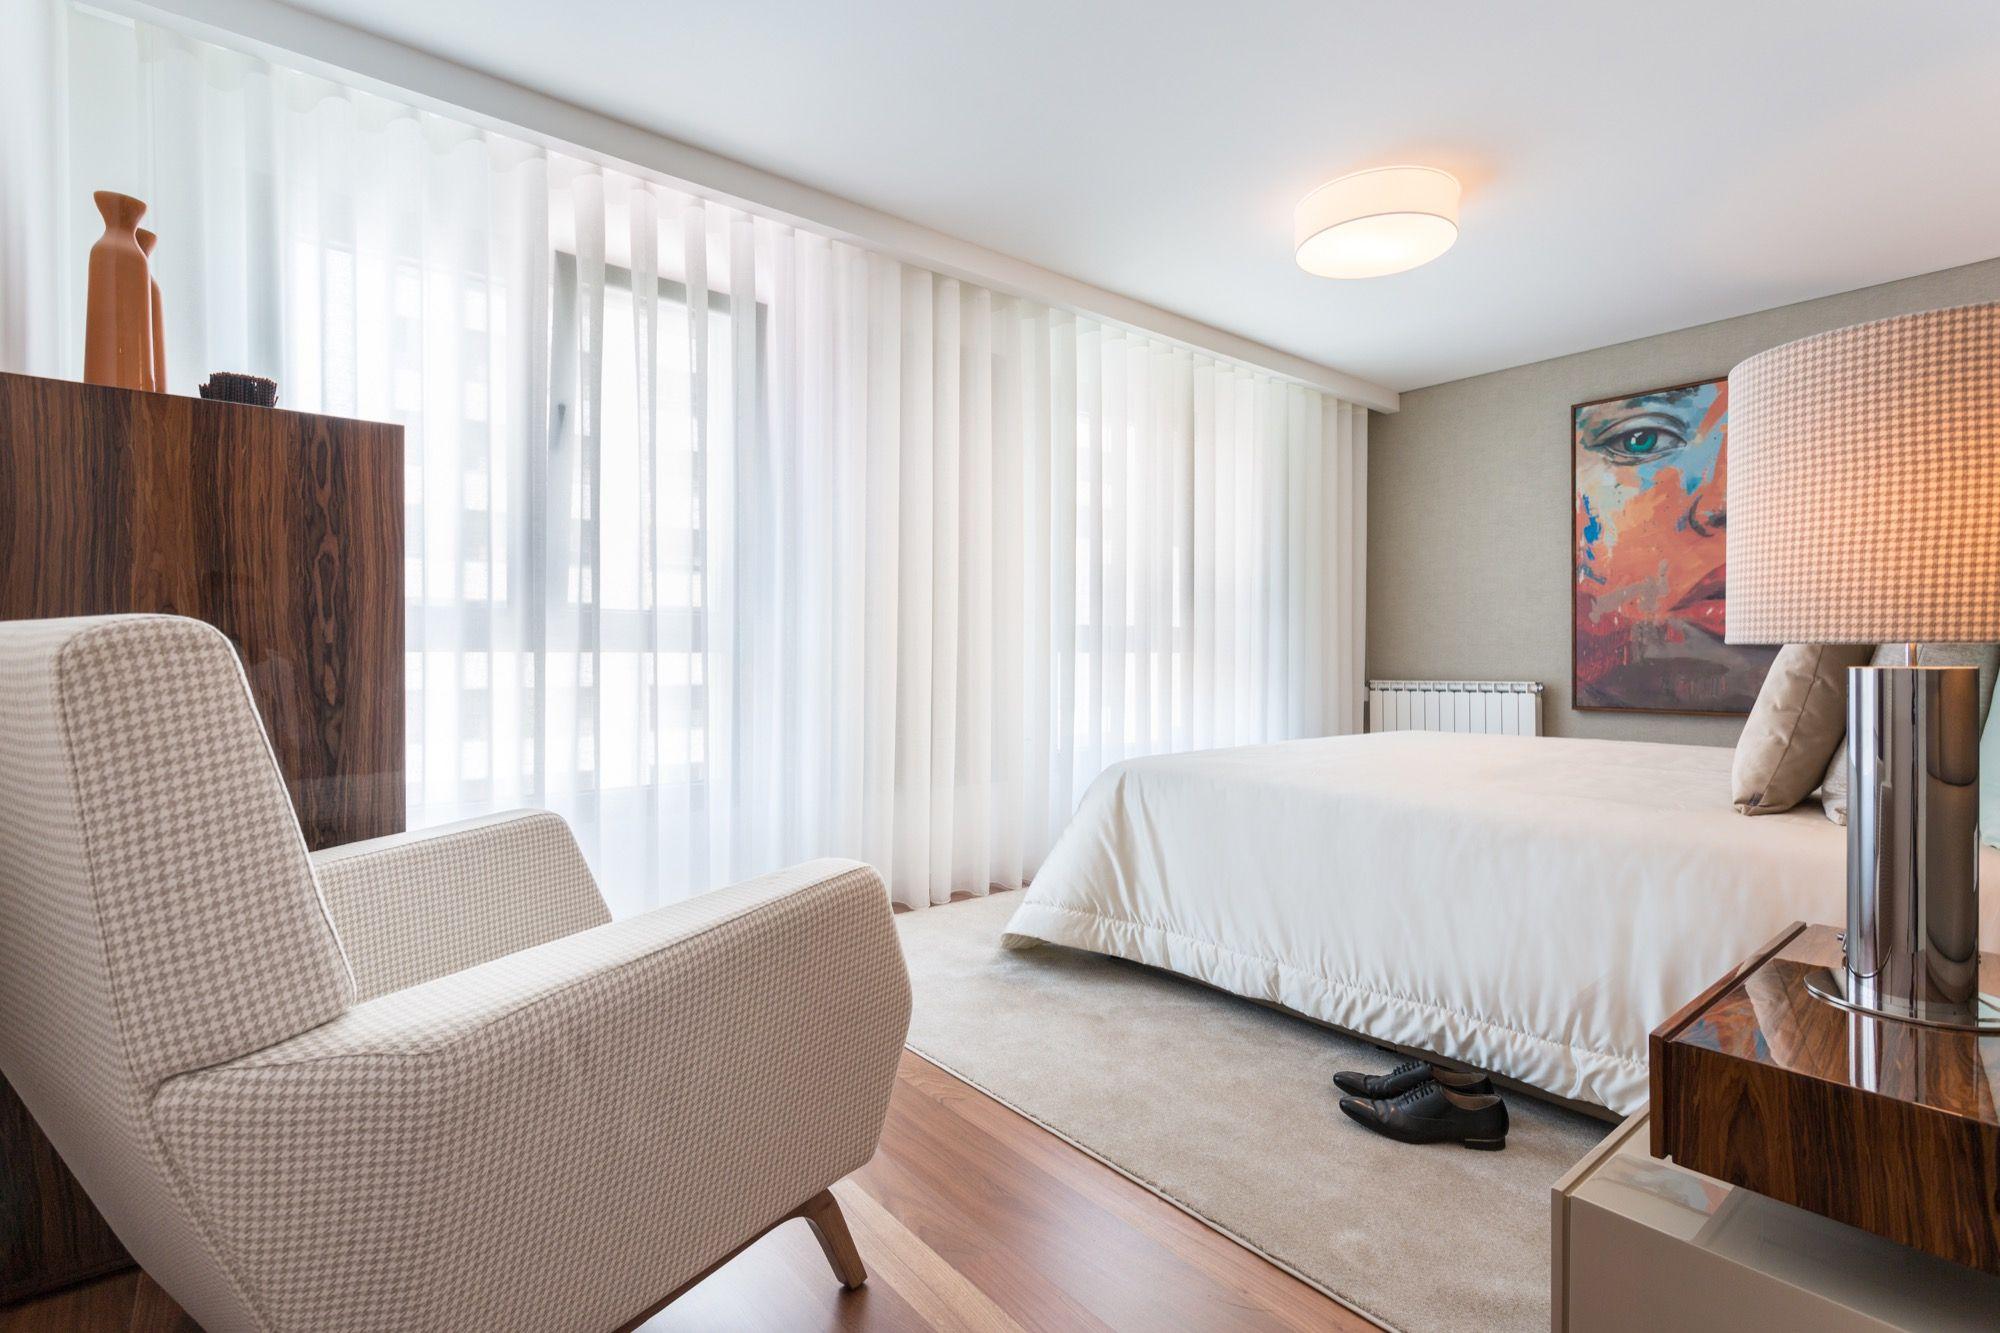 Apartamento T4 Foz | MOVELVIVO INTERIORES    #chavenamao #projectosmovelvivo #movelvivointeriores    Saiba mais: http://movelvivo.com/project/apartamento-t4-foz/